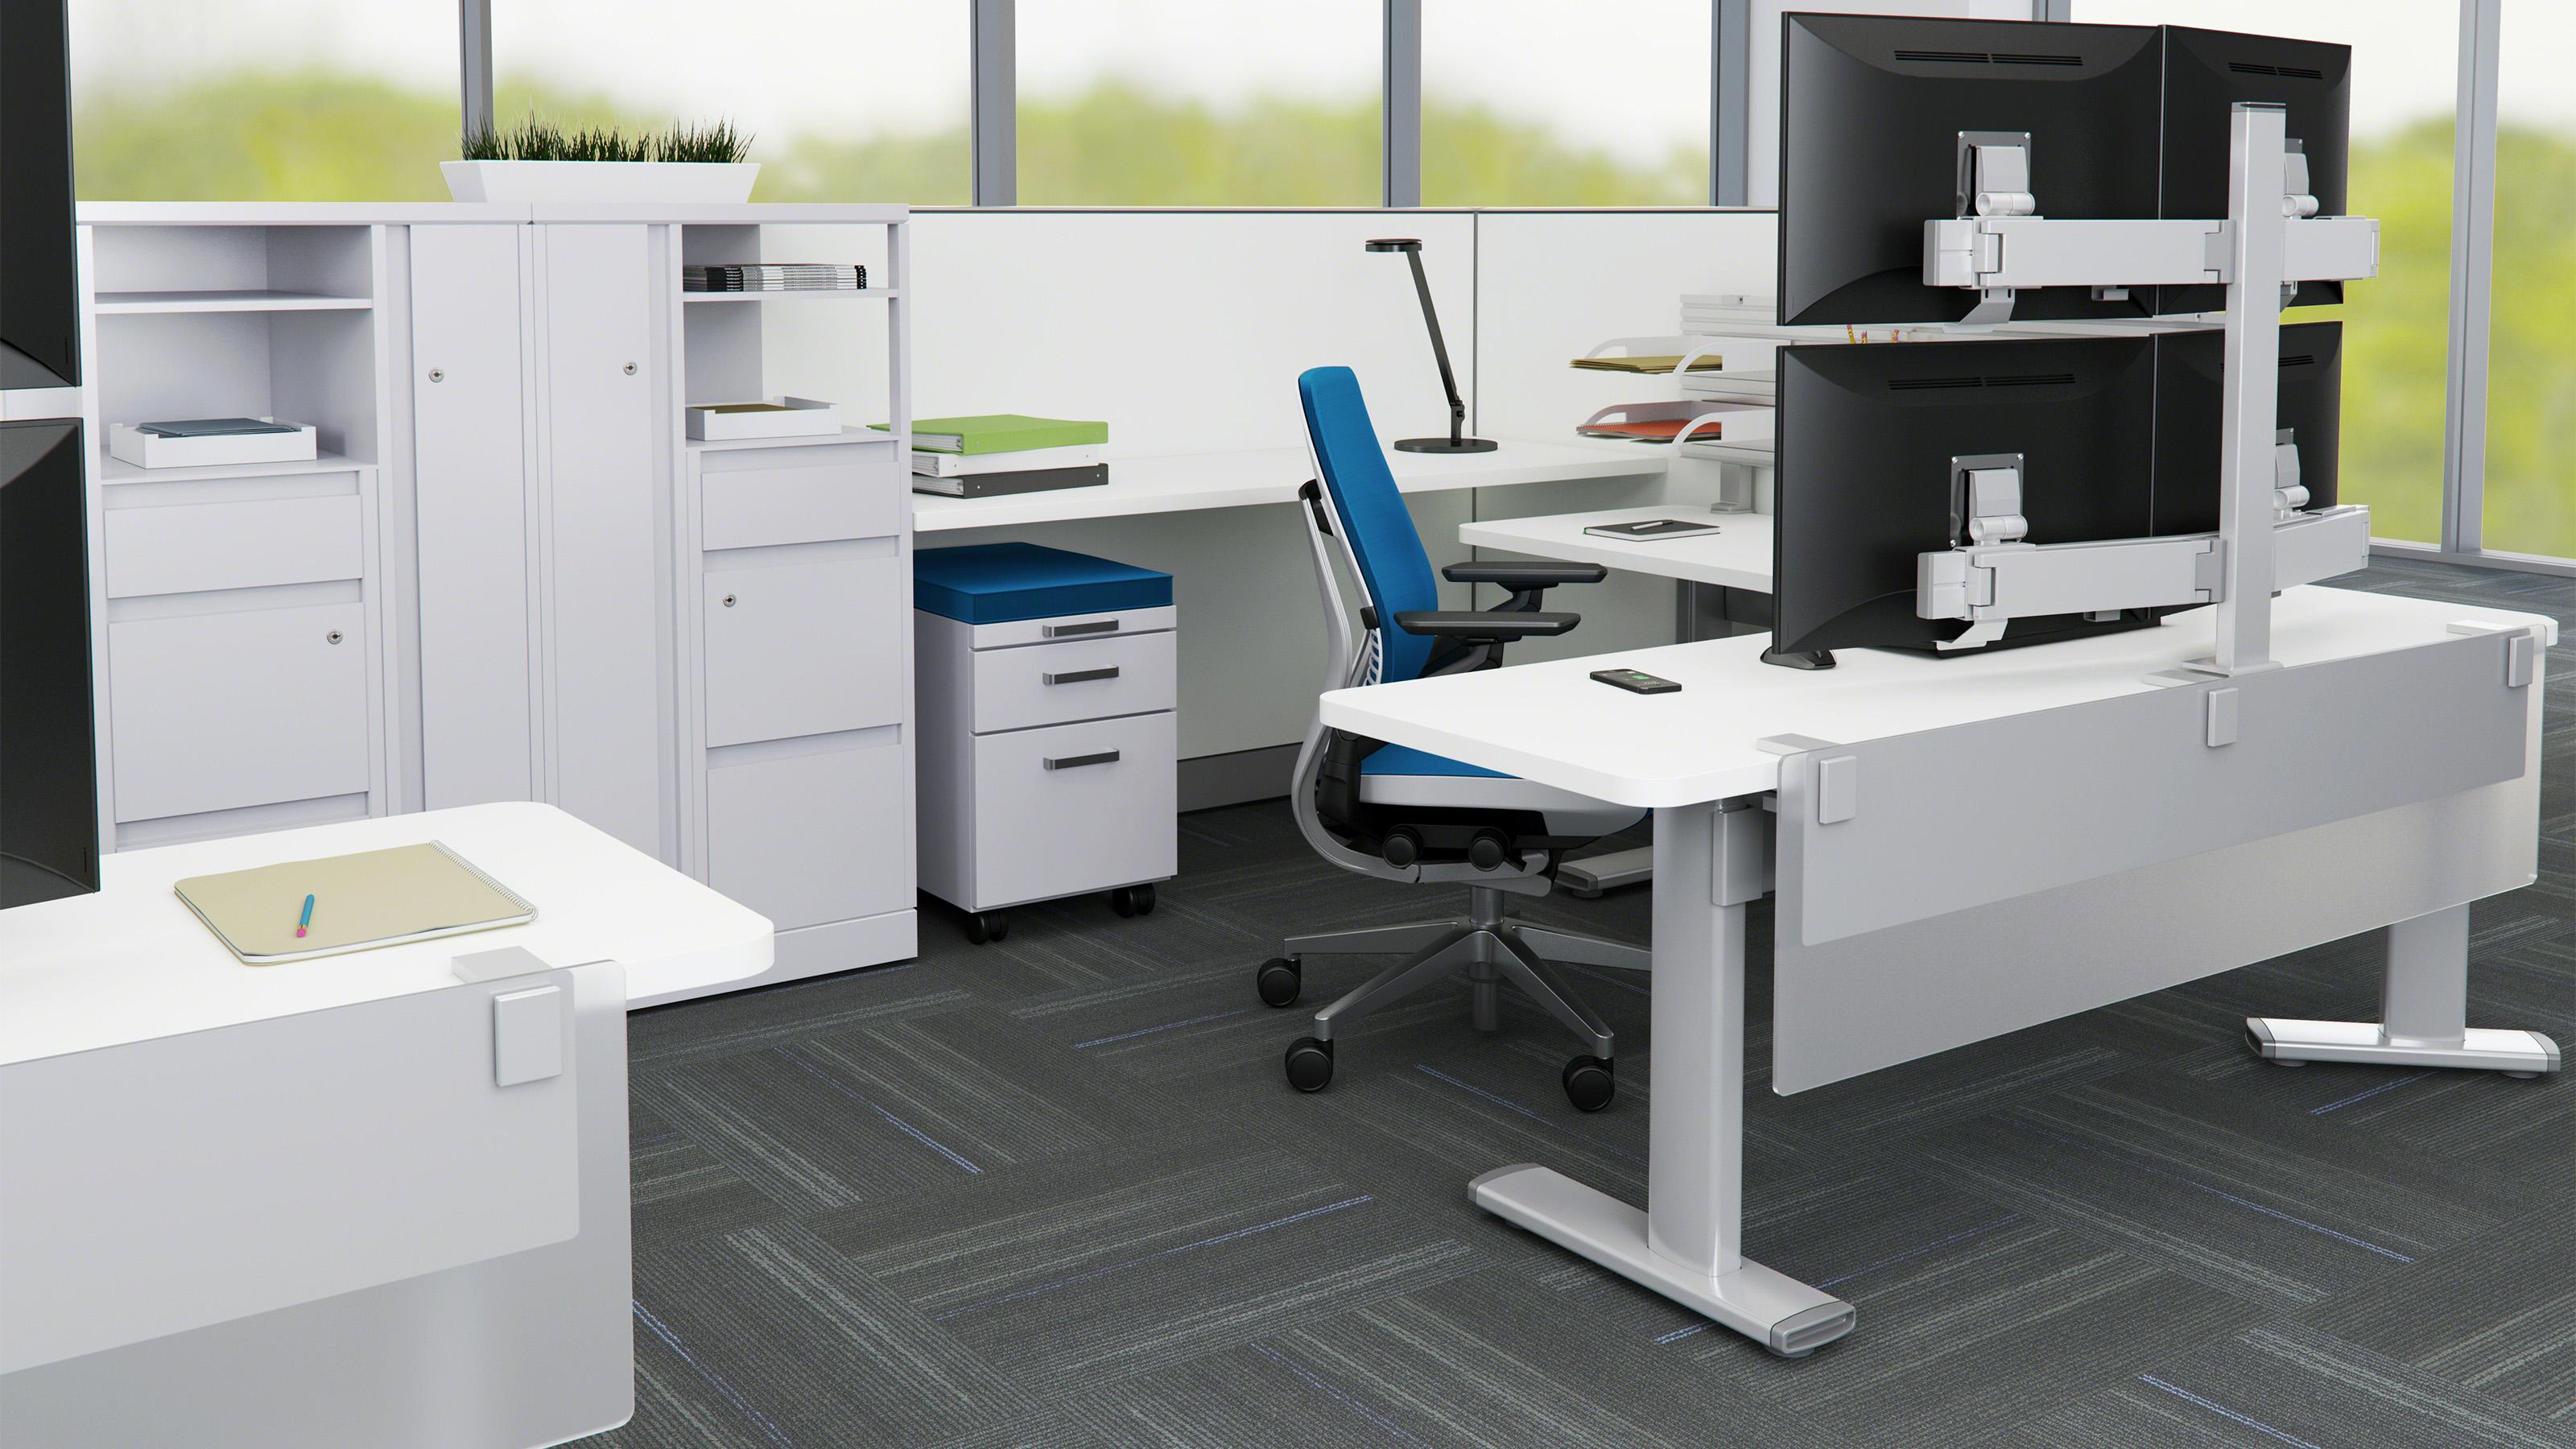 steelcase adjustable desk on vaporbullfl com steelcase adjustable desk on vaporbullfl com